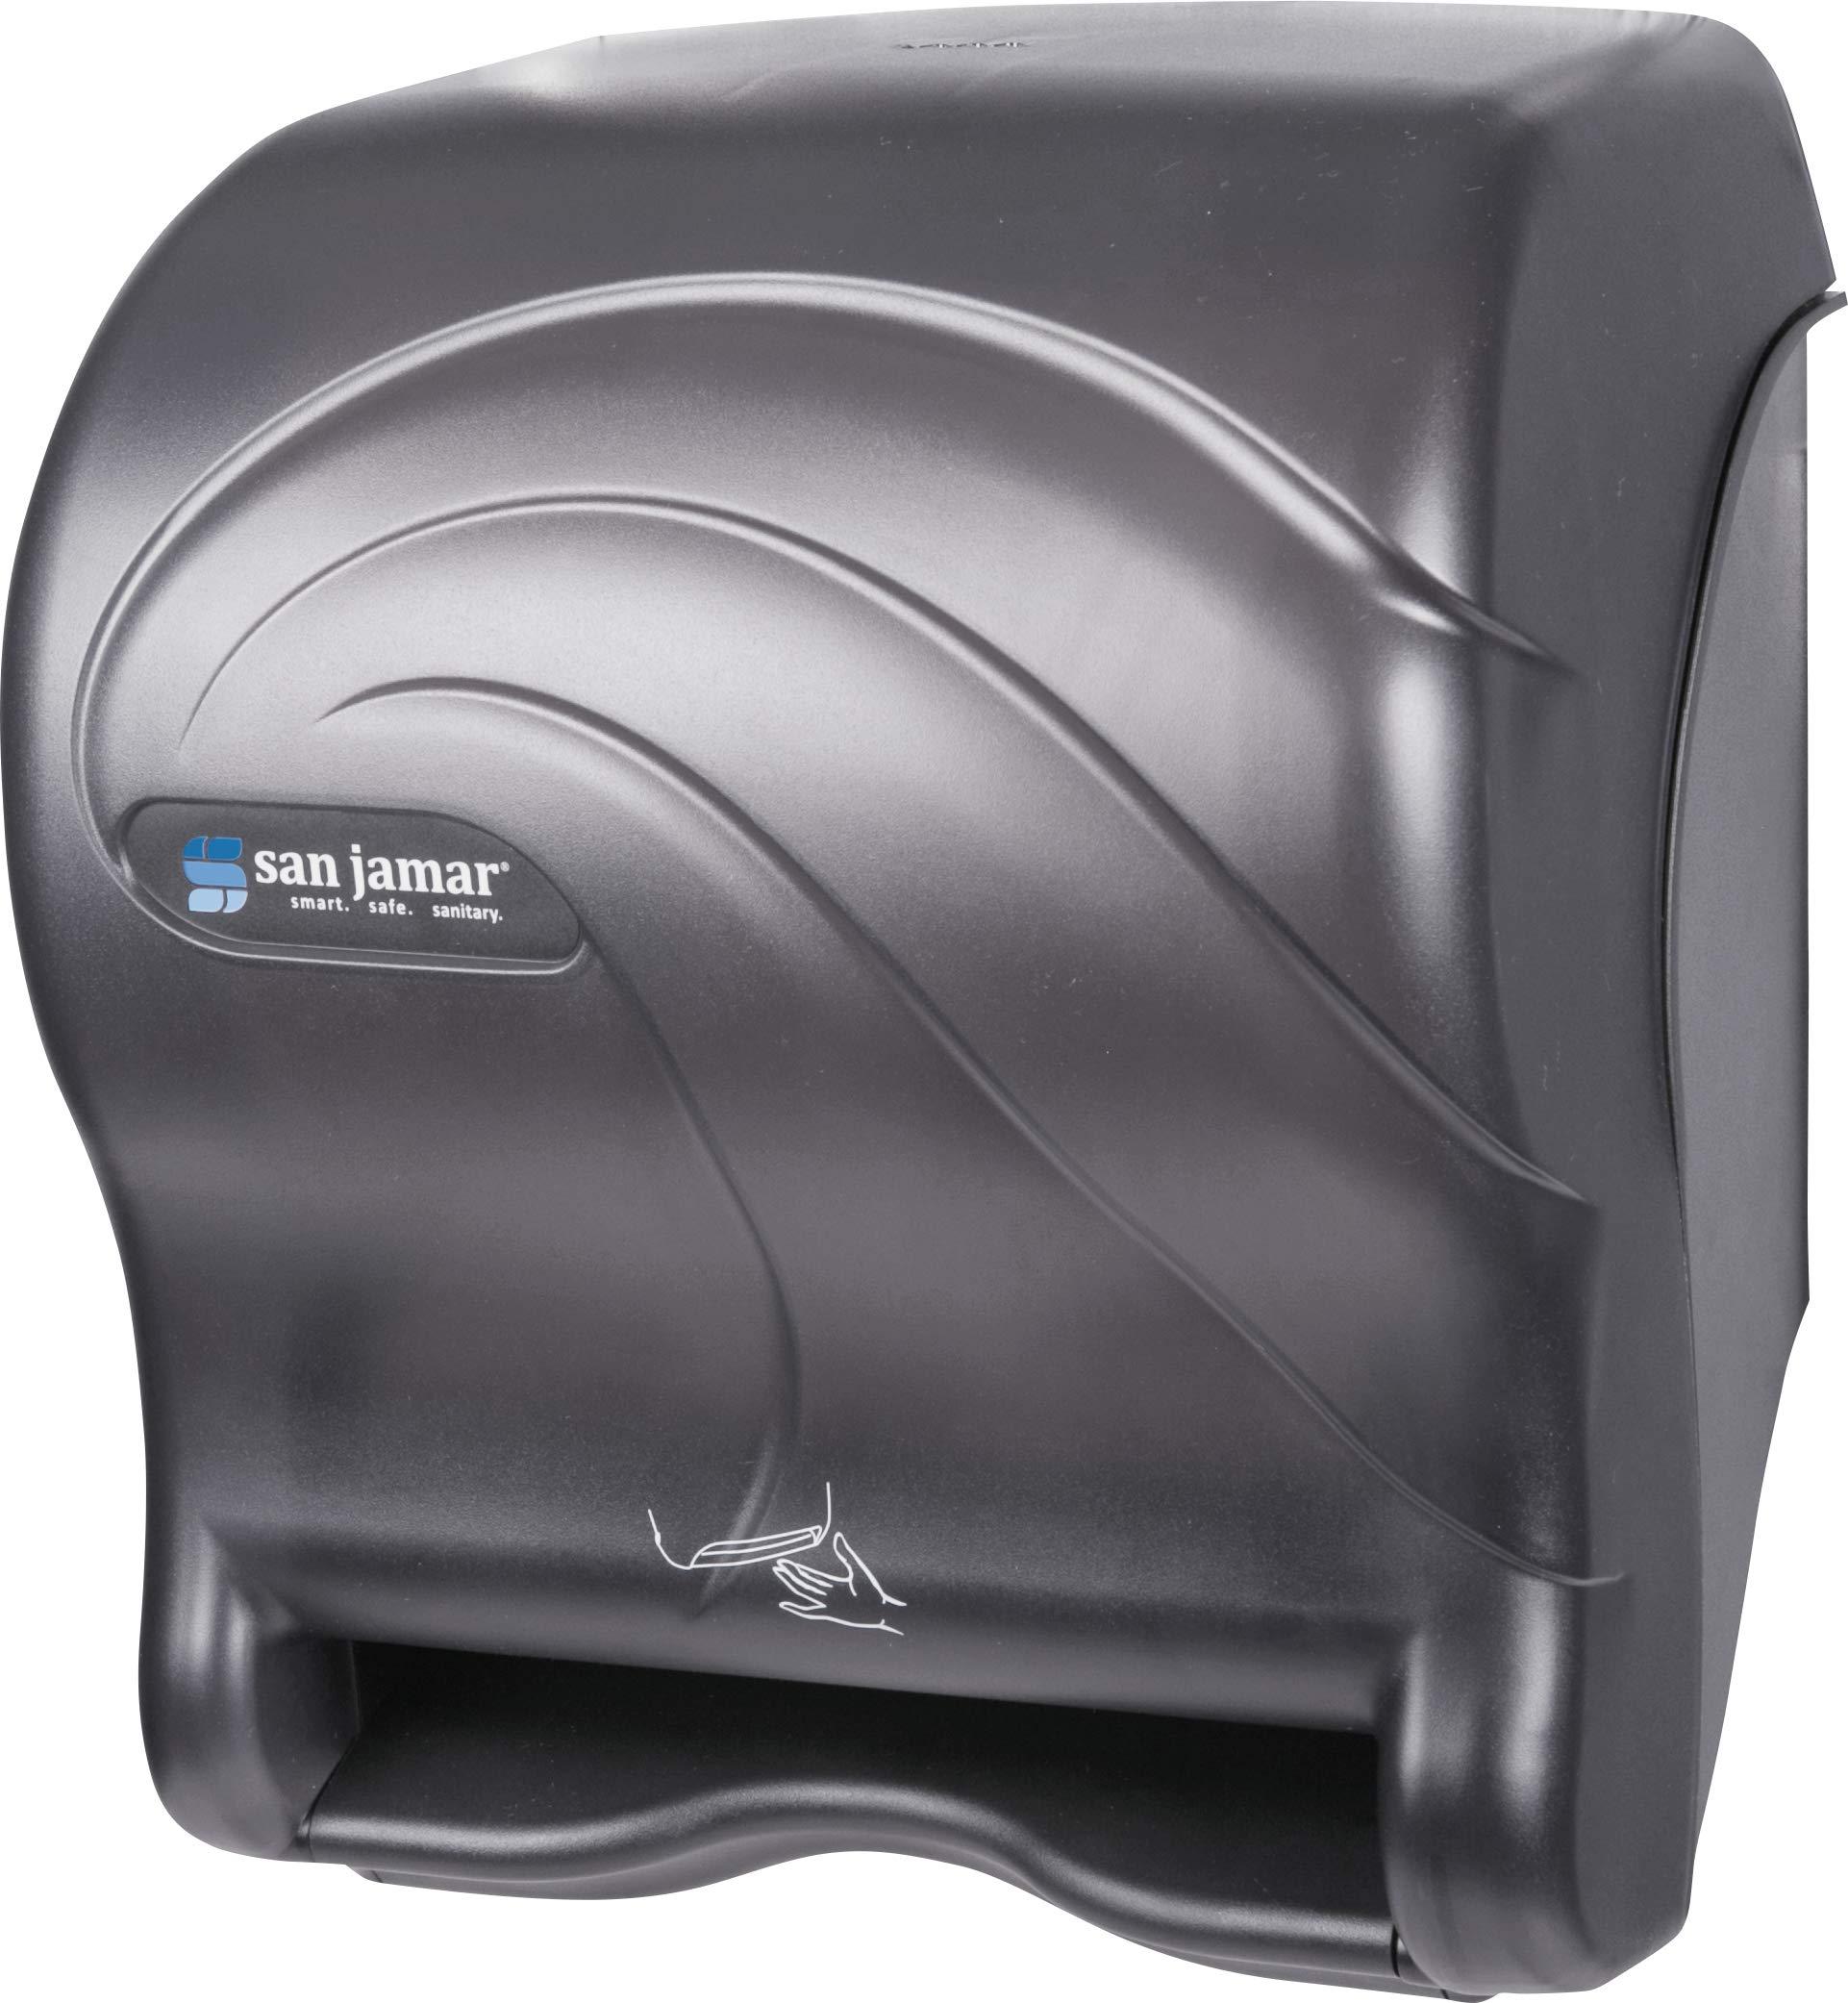 San Jamar T8490TBK Smart Essence Oceans Hands Free Paper Towel Dispenser, Black Pearl by San Jamar (Image #1)